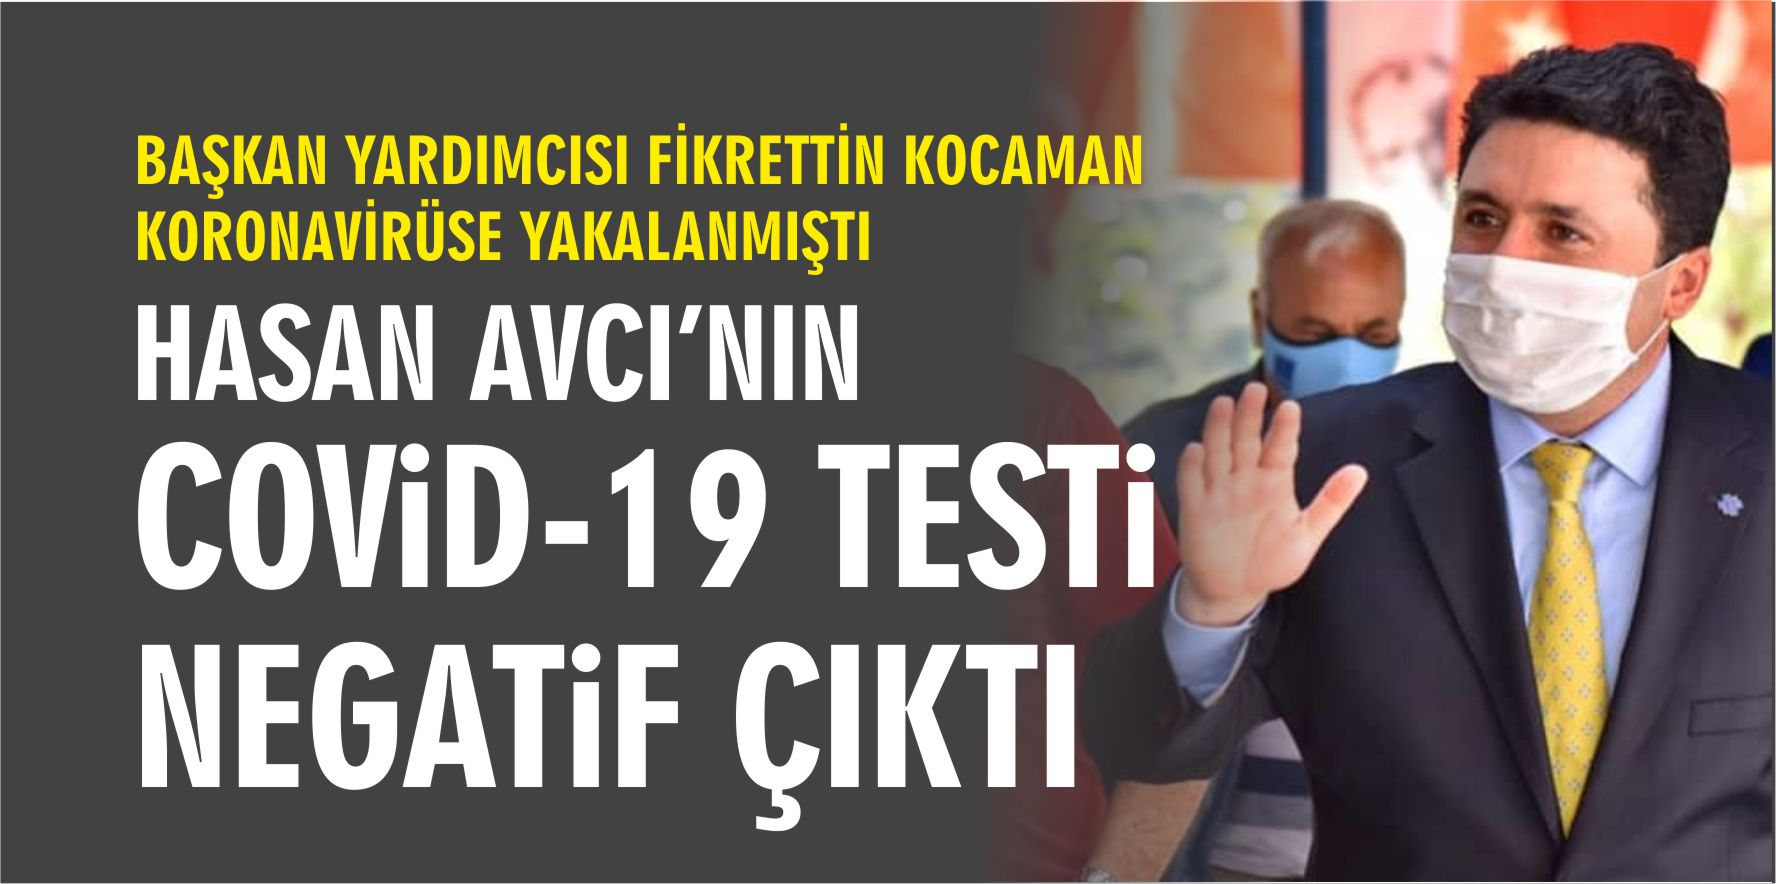 HASAN AVCI'NIN TESTİ NEGATİF ÇIKTI